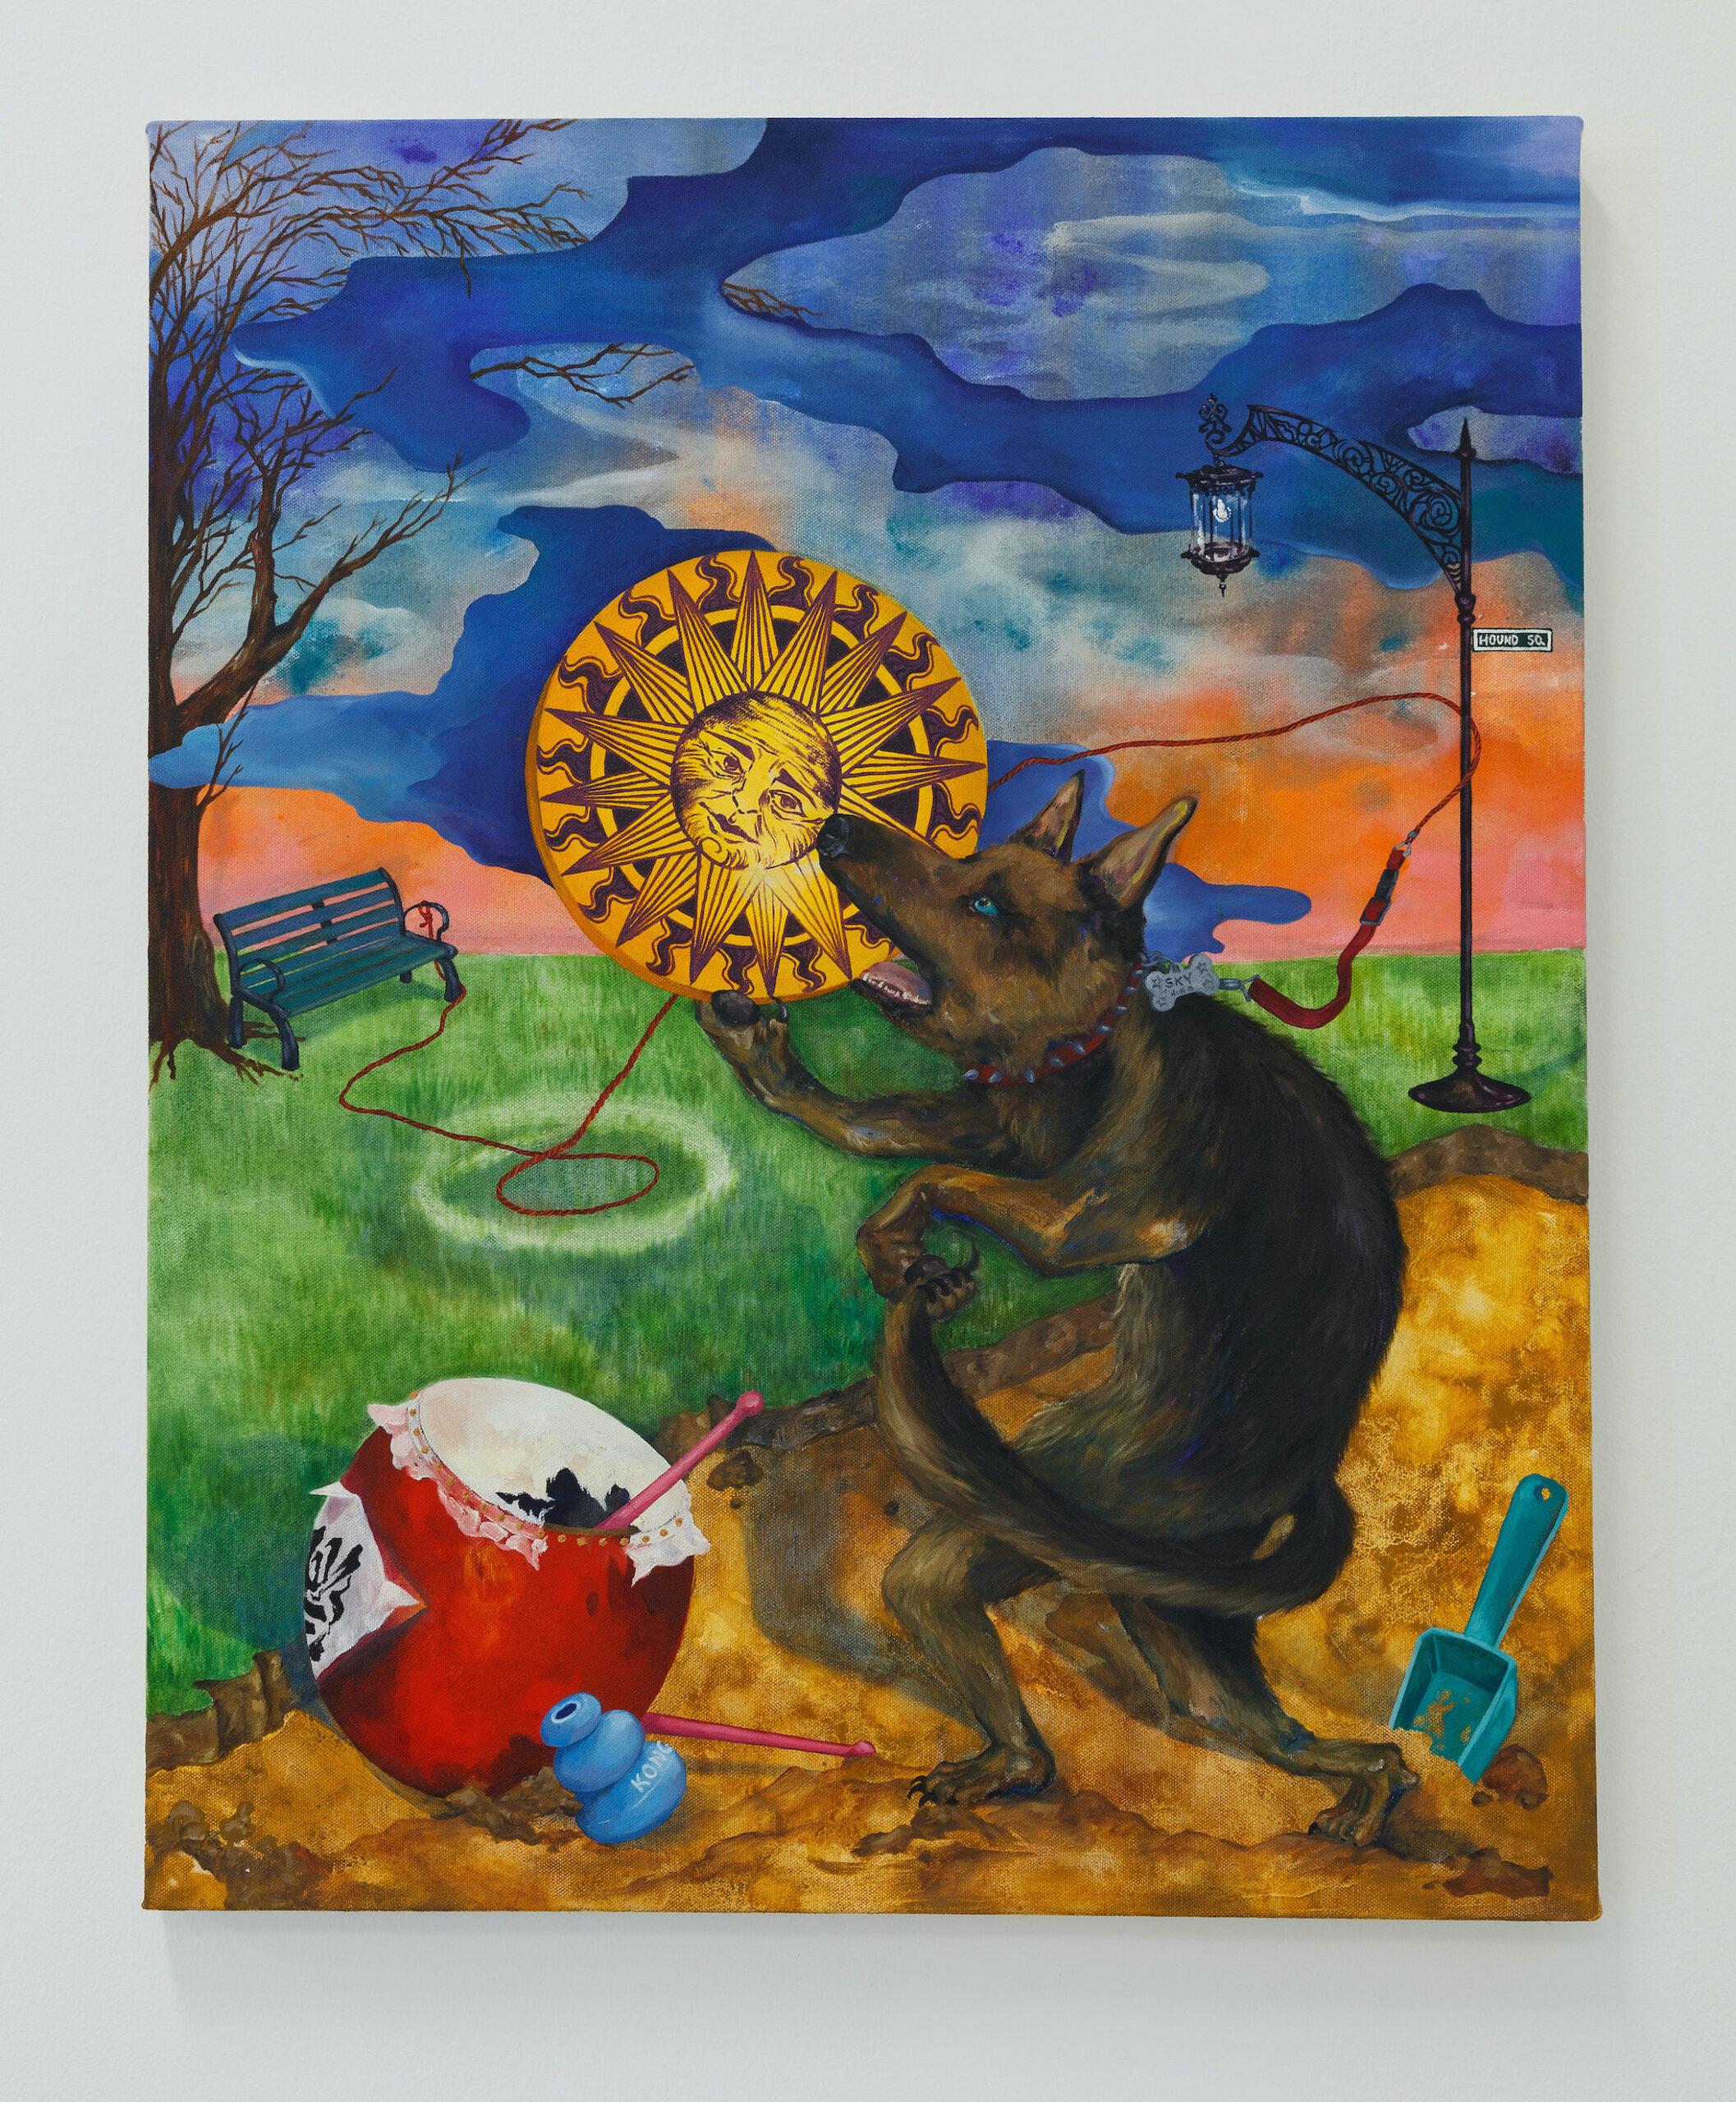 Eleen Lin, Dog Eat Sun, 2013, Oil on canvas, 24 x 30 inches, Emerson Dorsch, Miami FL